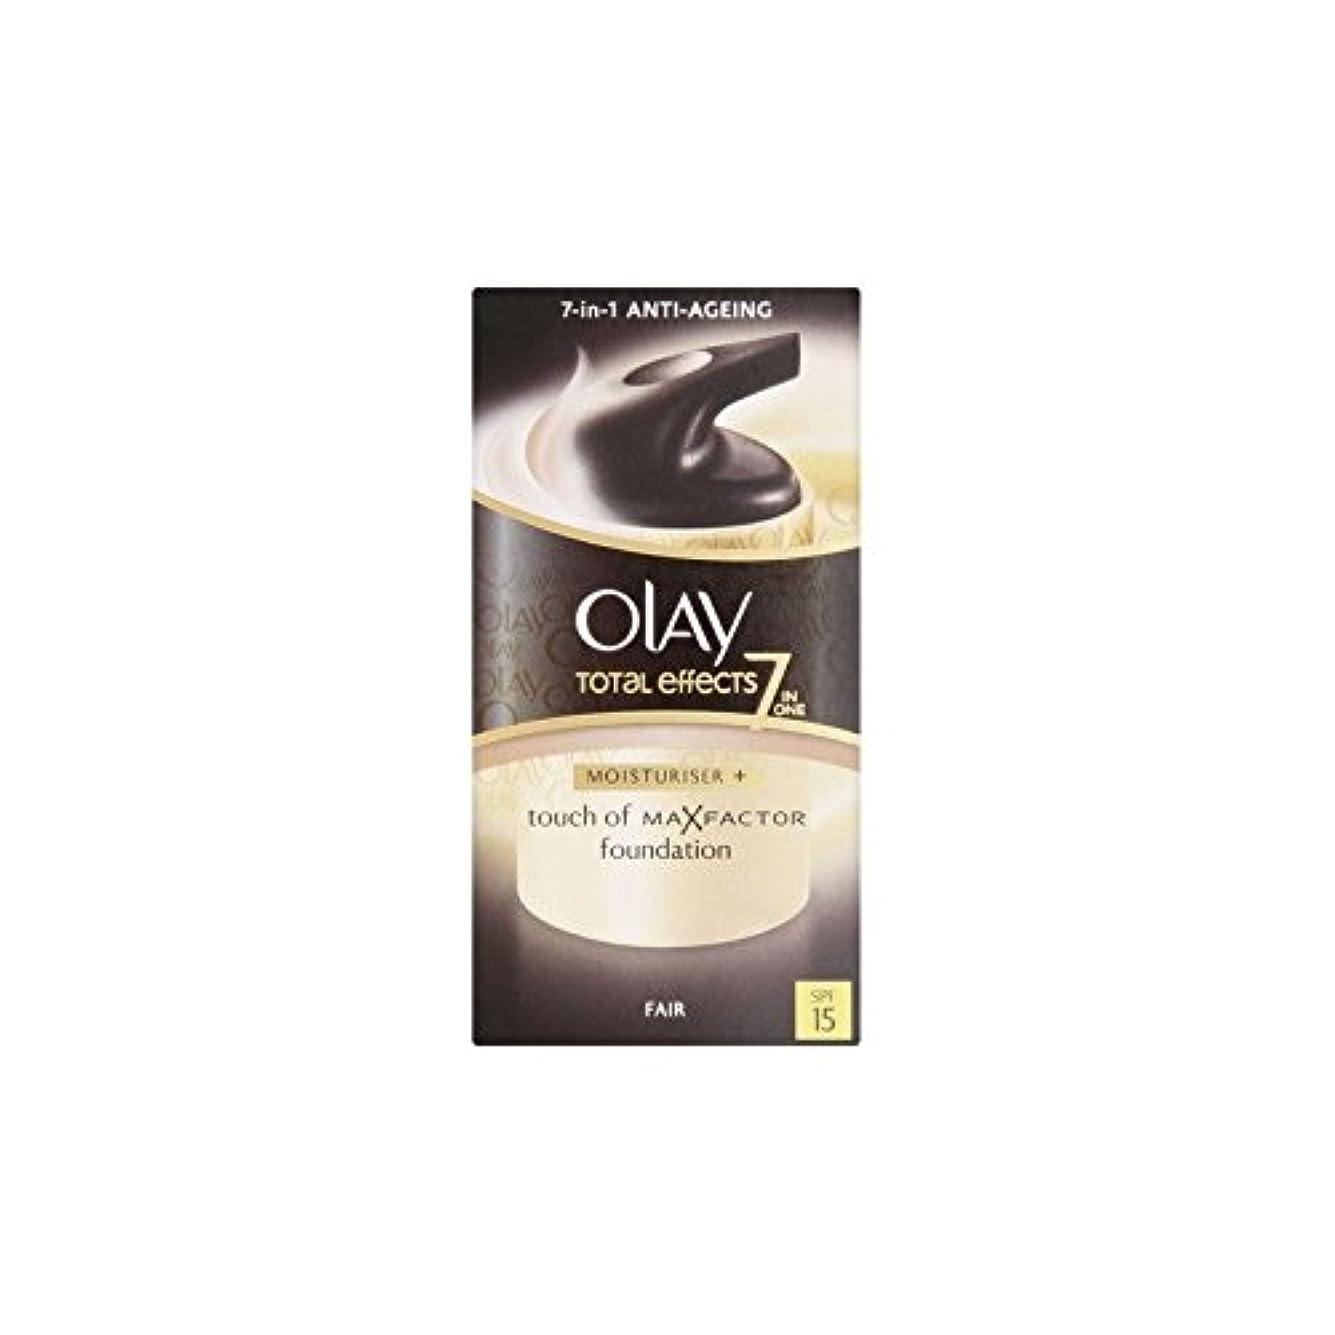 Olay Total Effects Moisturiser Bb Cream Spf15 - Fair (50ml) - オーレイトータルエフェクト保湿クリーム15 - フェア(50ミリリットル) [並行輸入品]